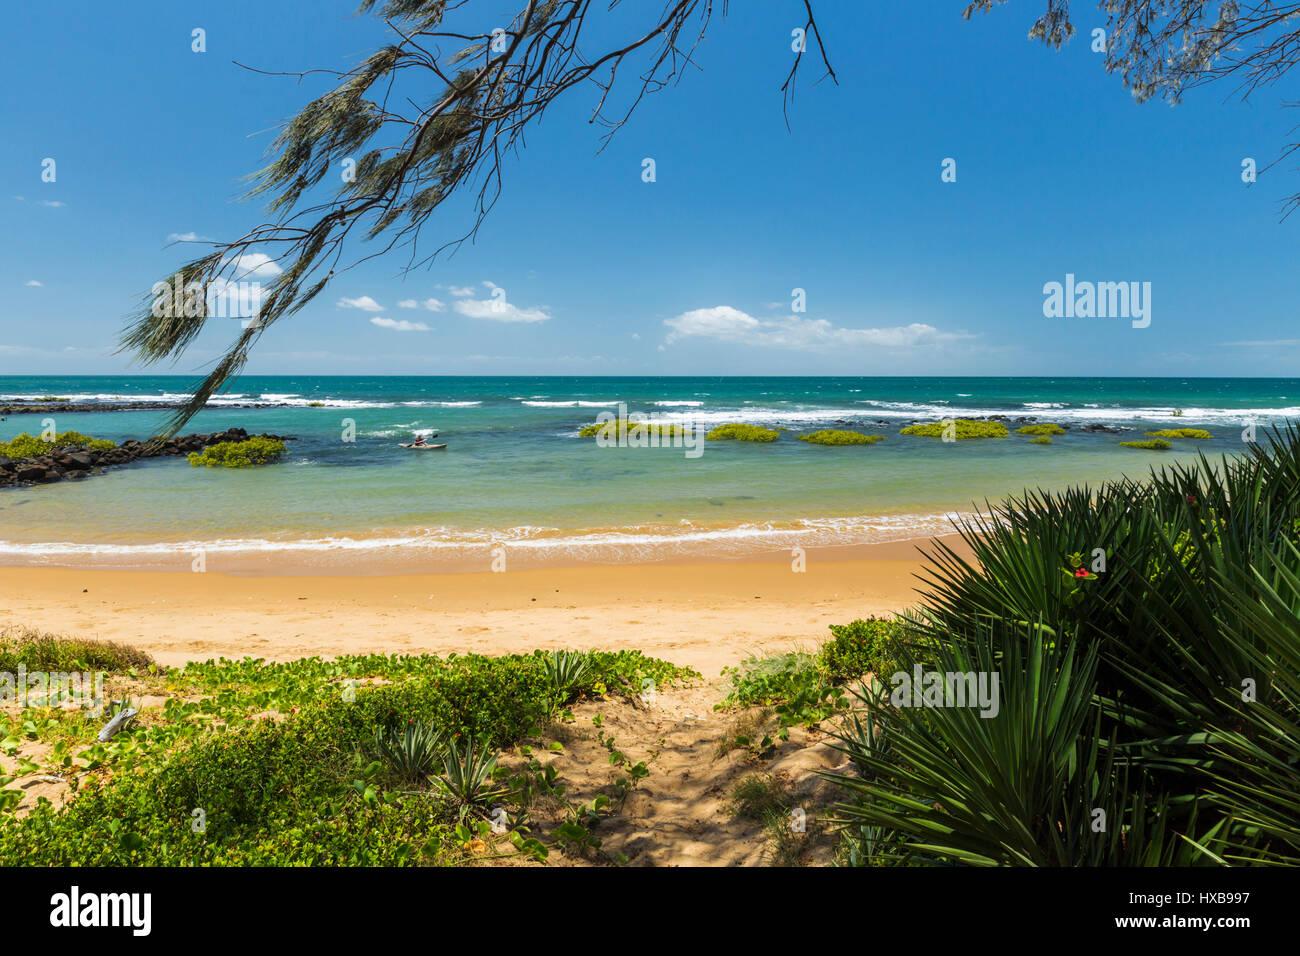 View along Bargara Beach at dawn, Bundaberg, Queensland, Australia - Stock Image